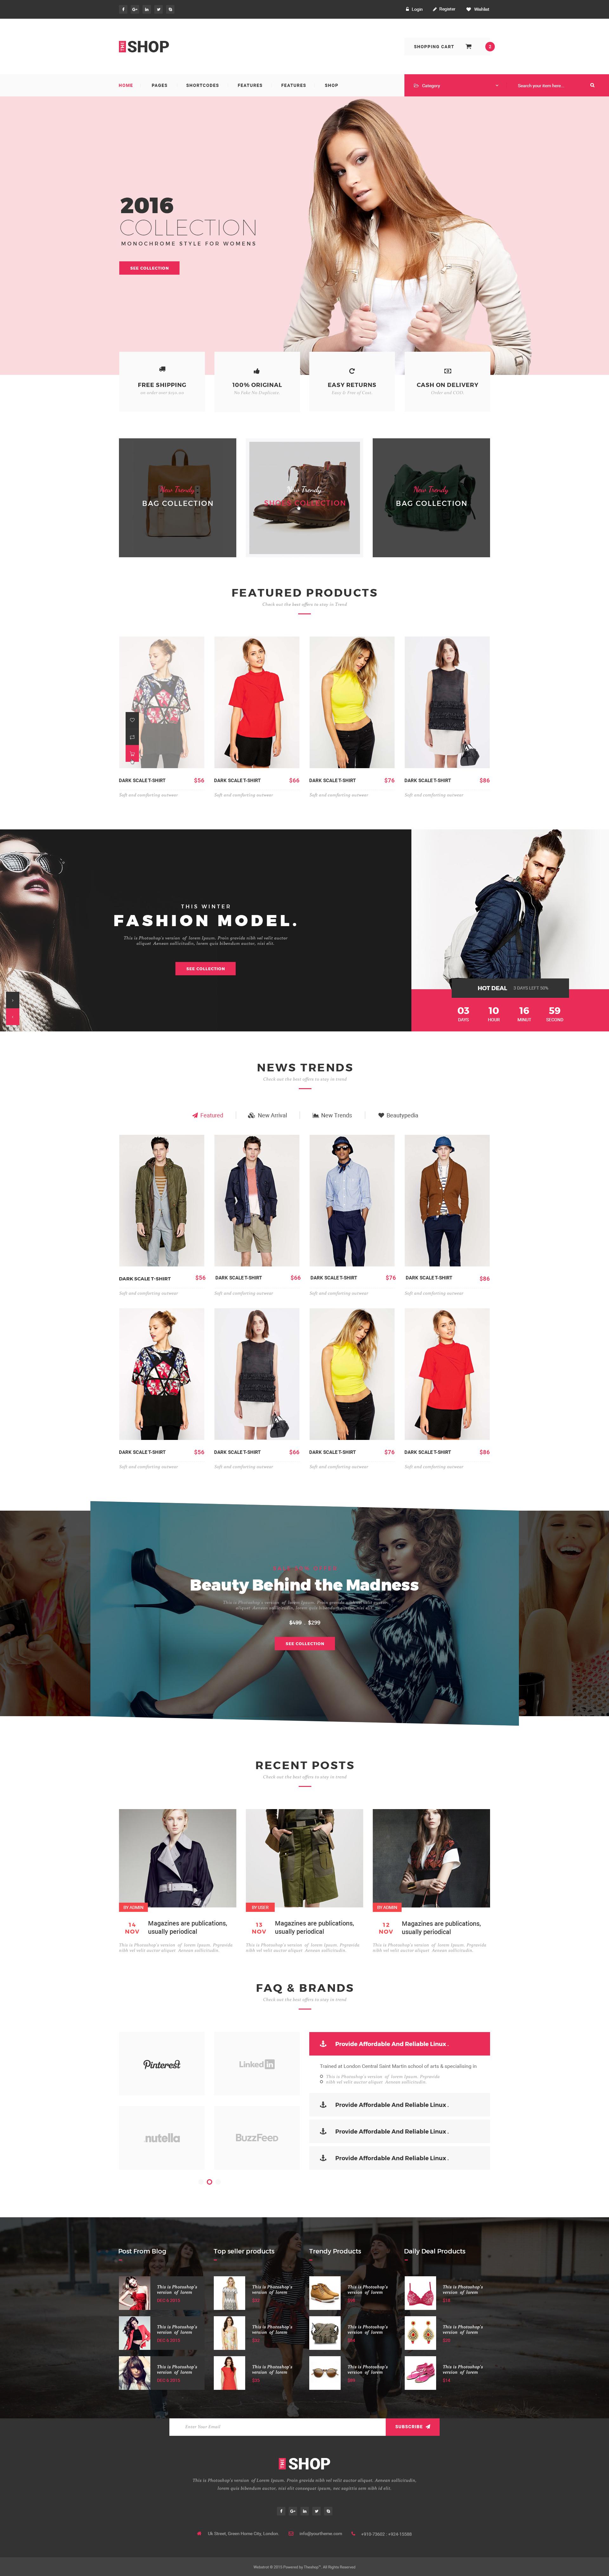 The Shop | e-commerce PSD Template